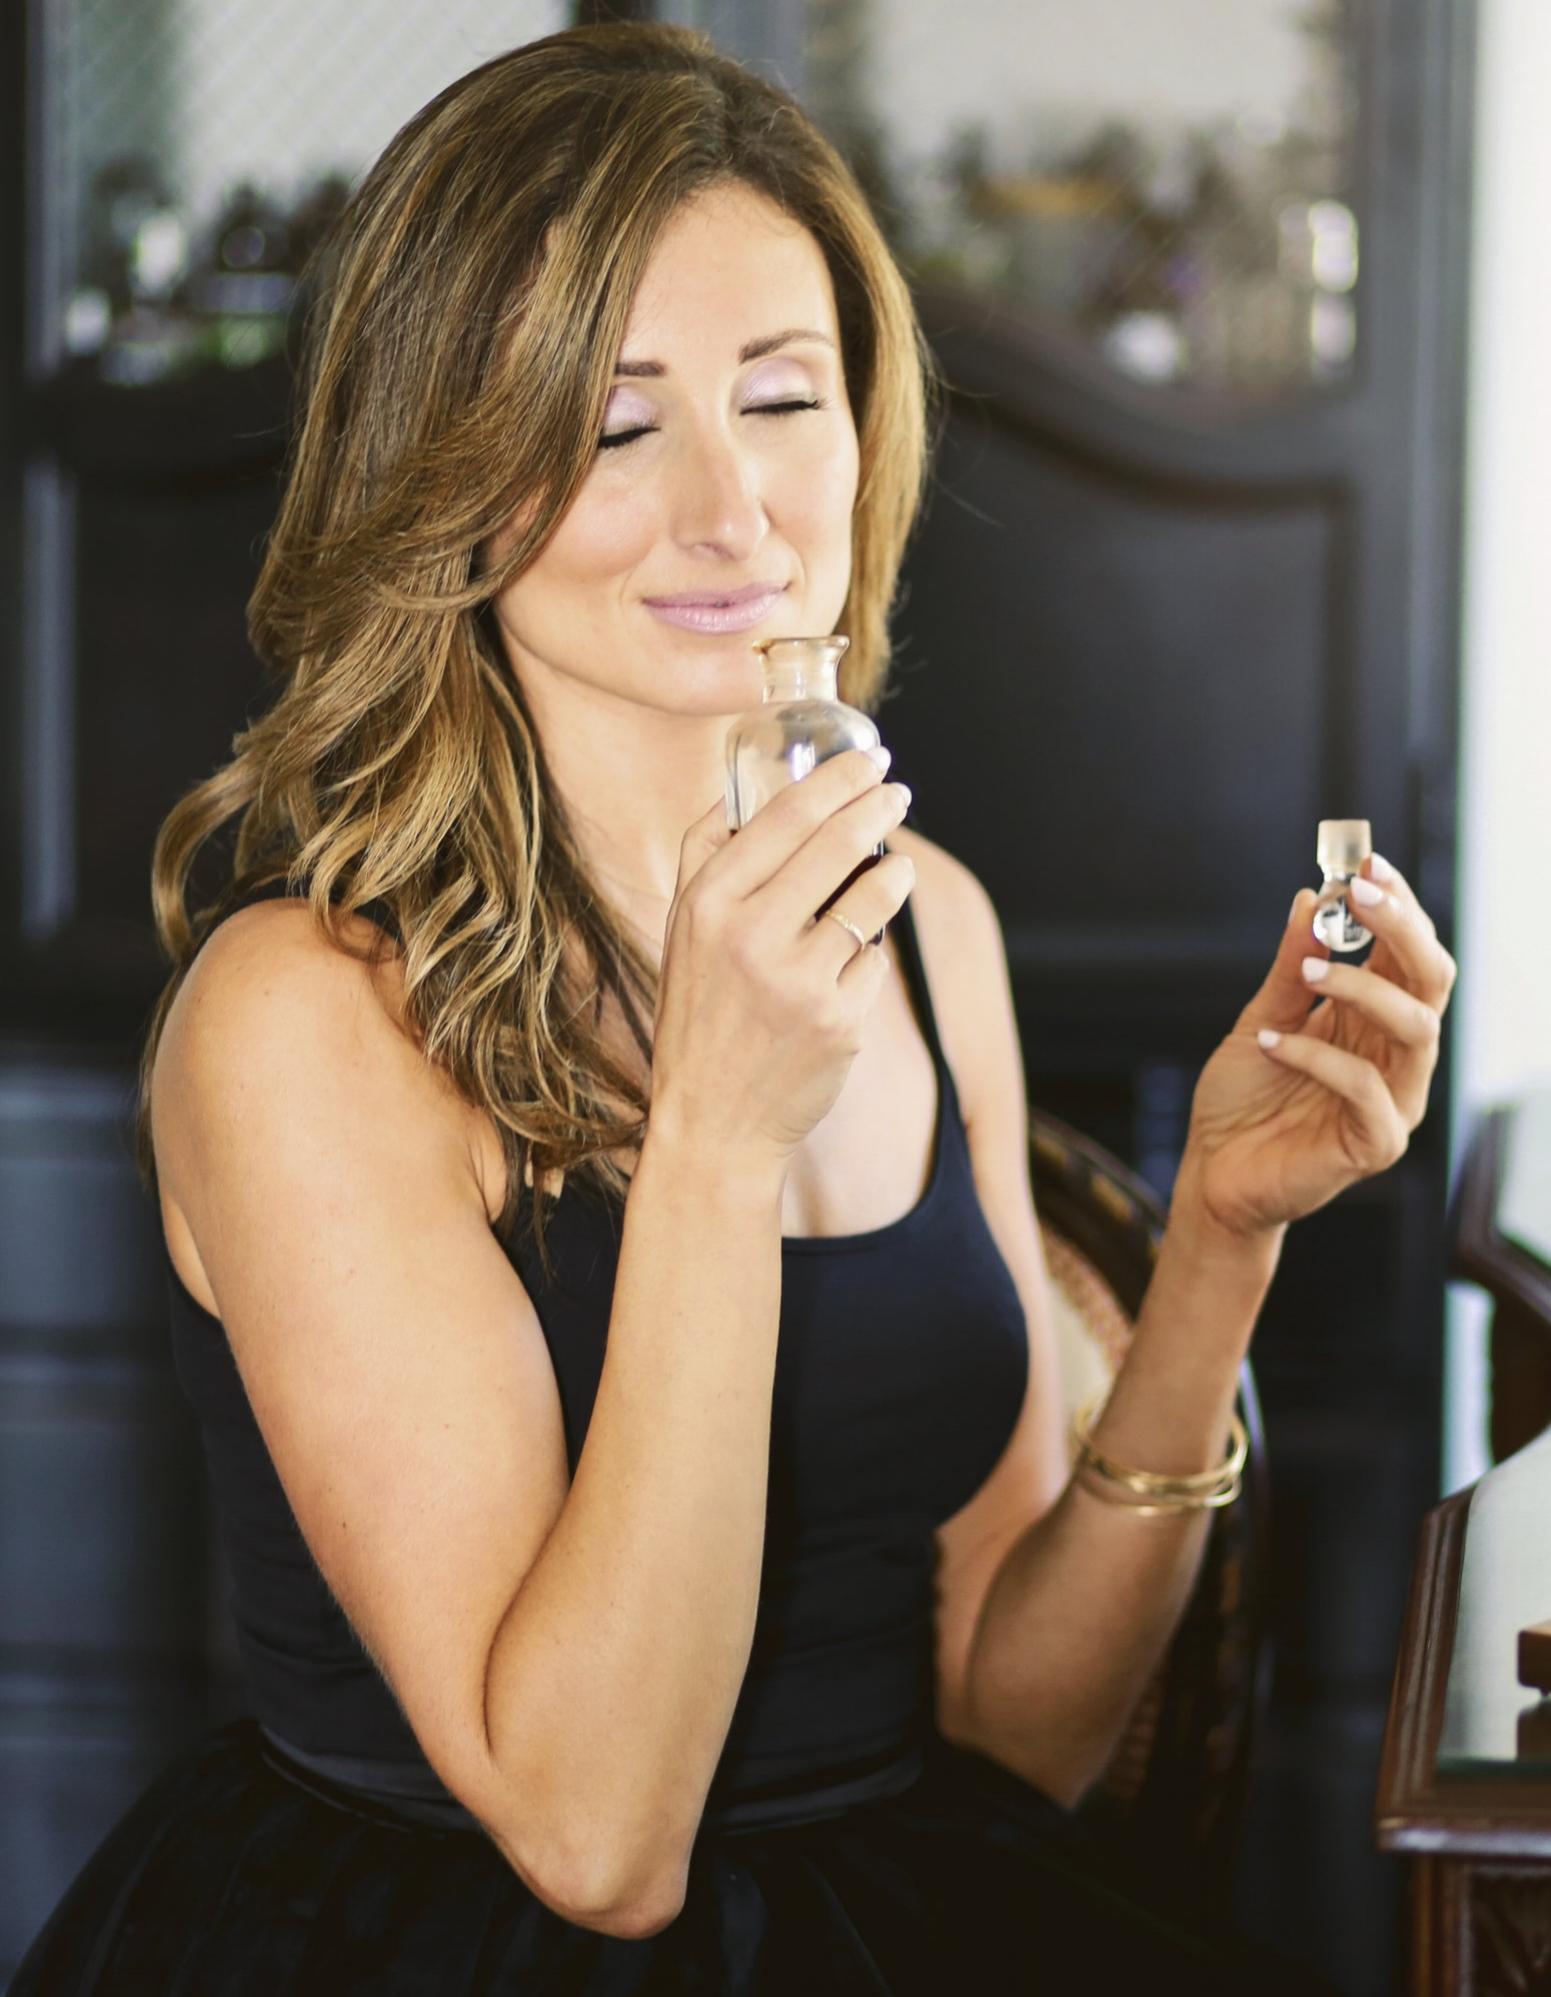 Elena-Bensonoff-Natural-Perfumes.JPG